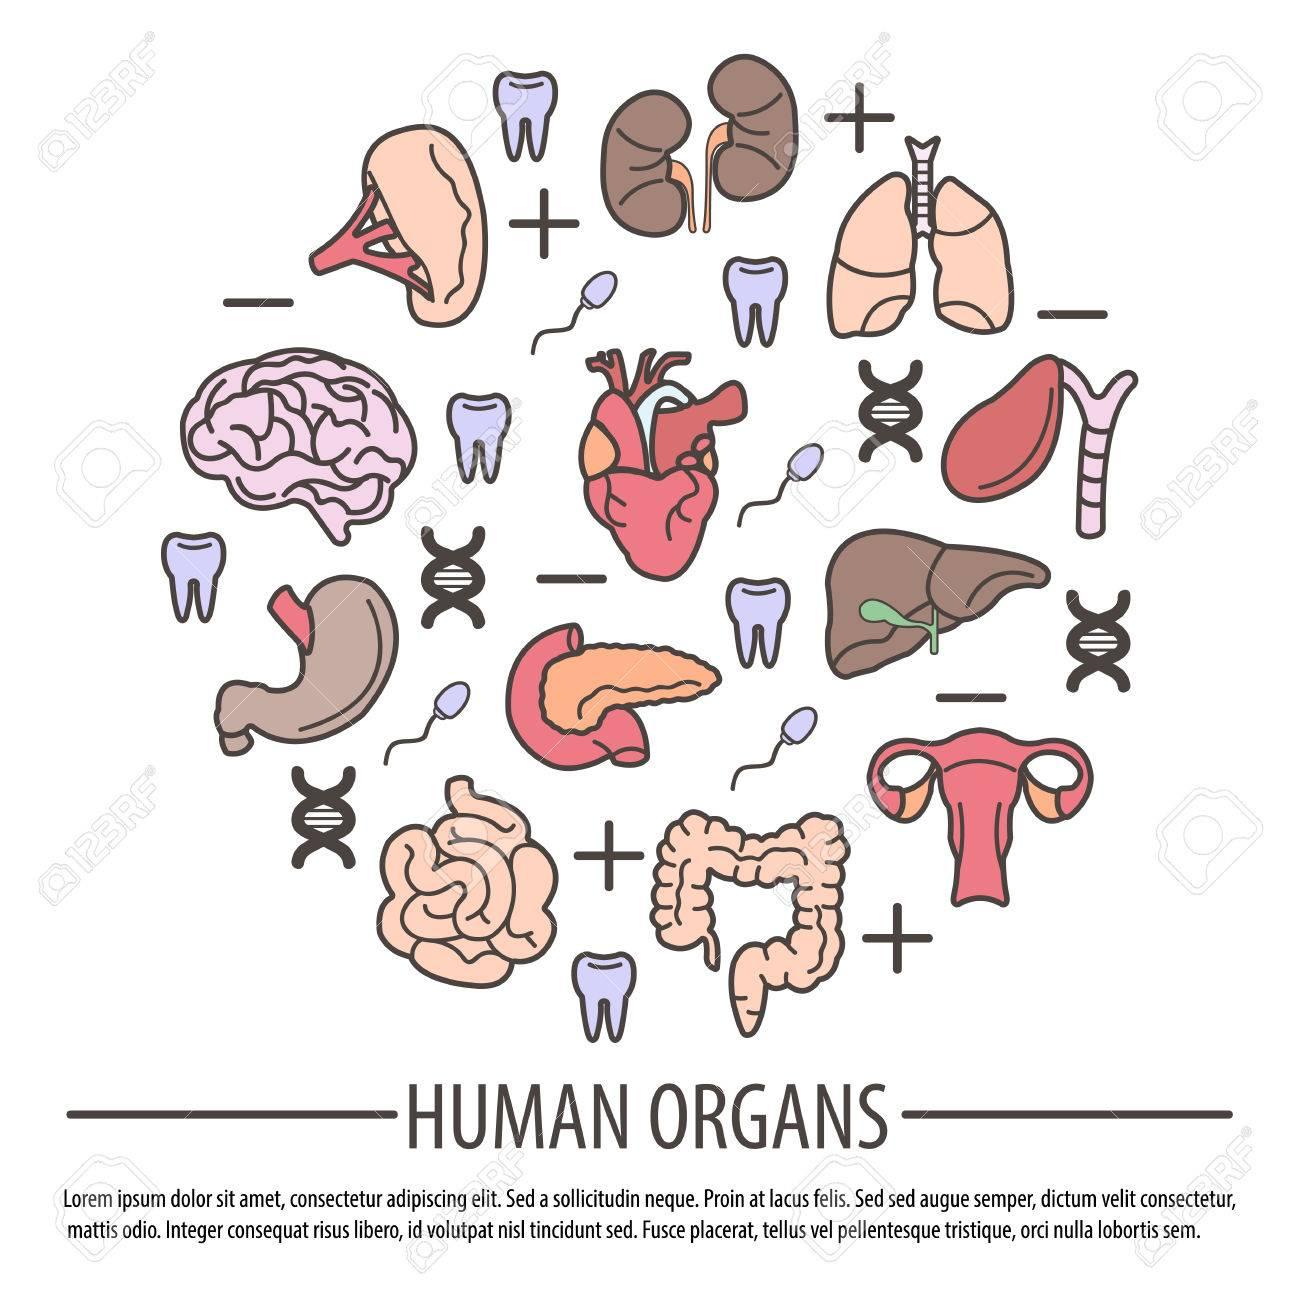 DNA の部分、Rh 因子と歯と臓器のイラスト素材・ベクタ - Image 71454621.